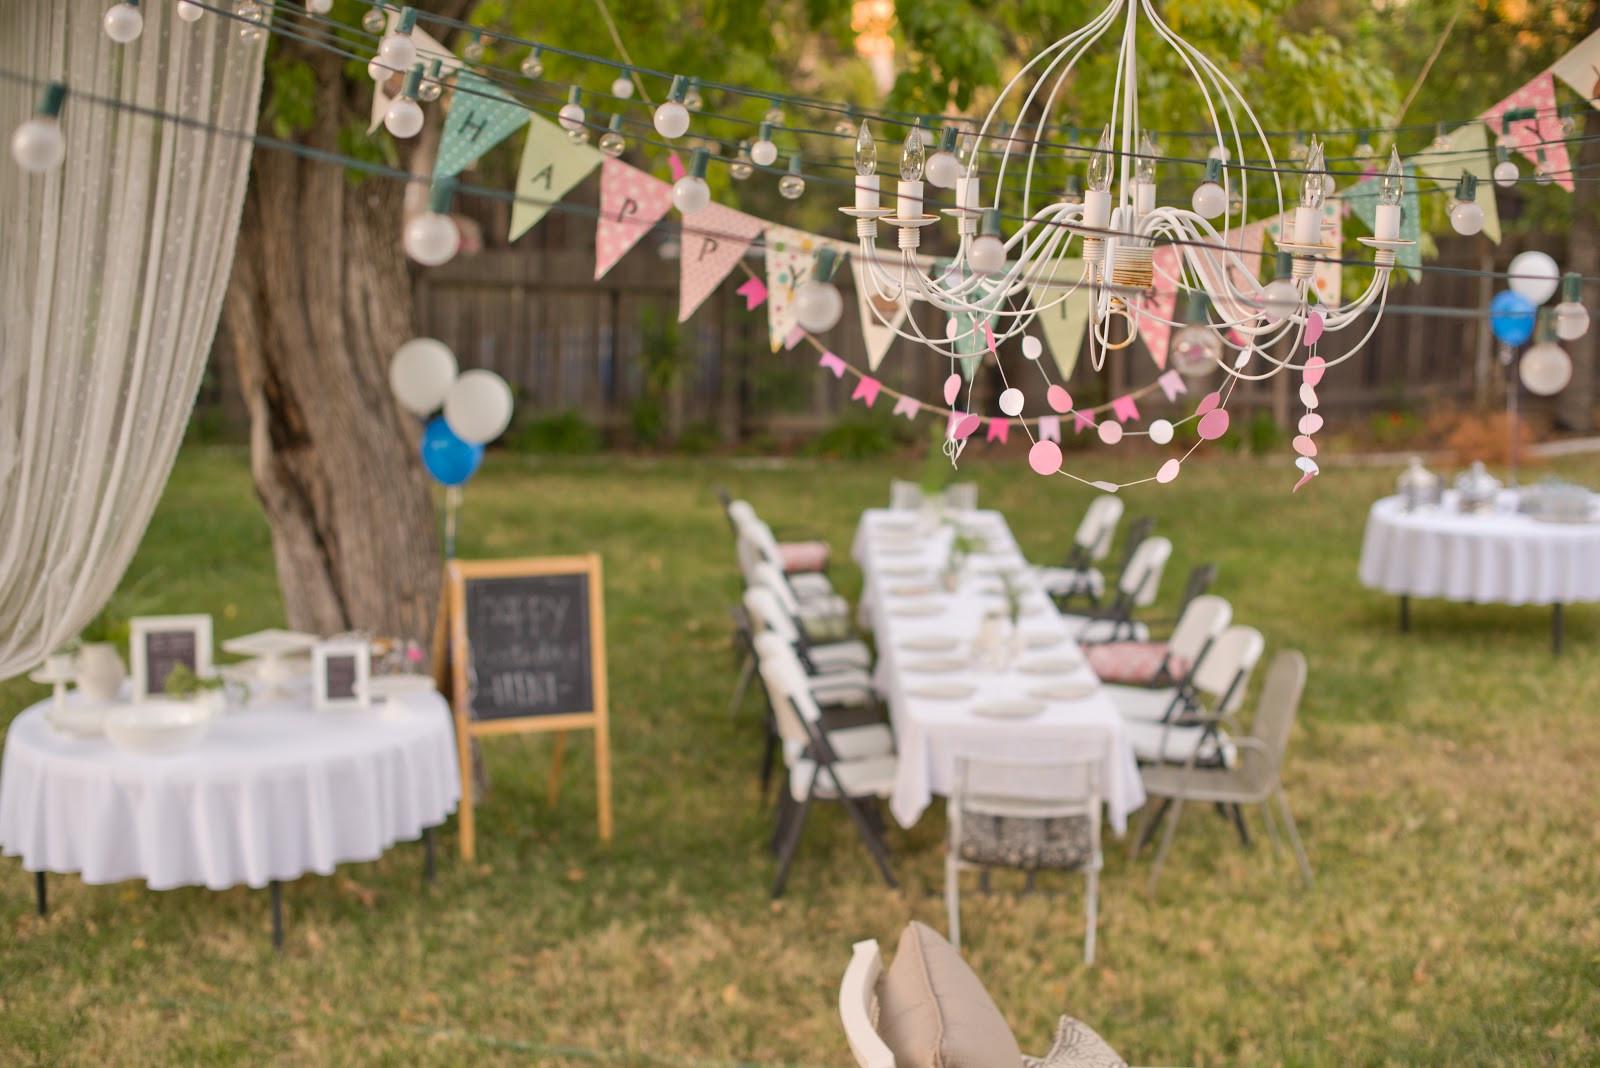 Backyard 21St Birthday Party Ideas  Domestic Fashionista 31 Days of Creative Homemaking